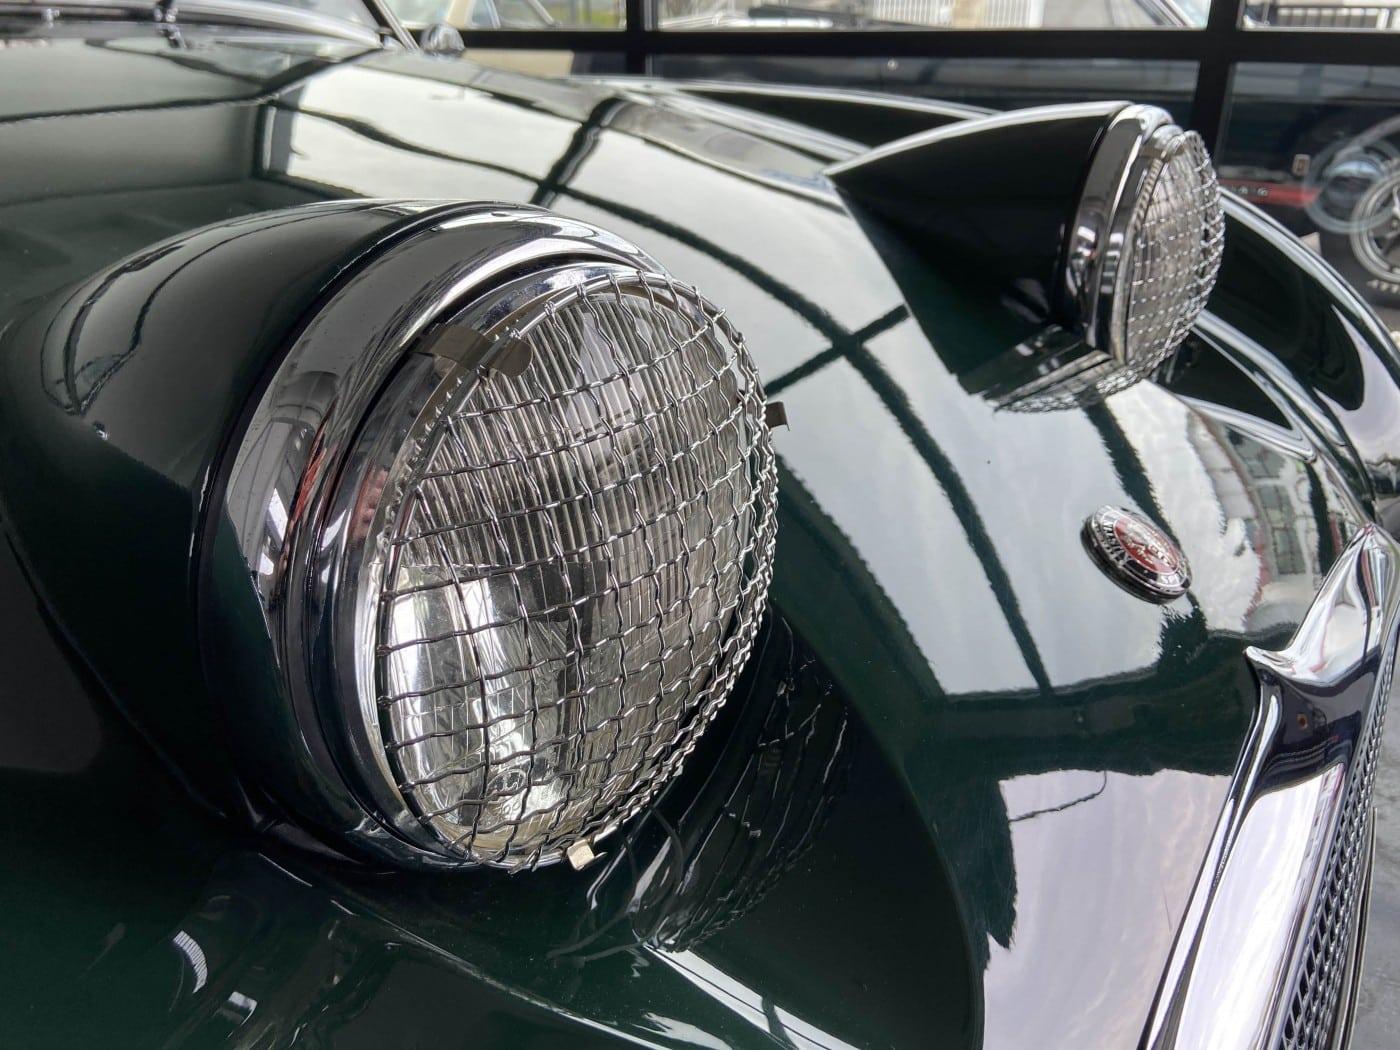 voiture-ancienne-cforcar-austin-frogeye-vhc-25